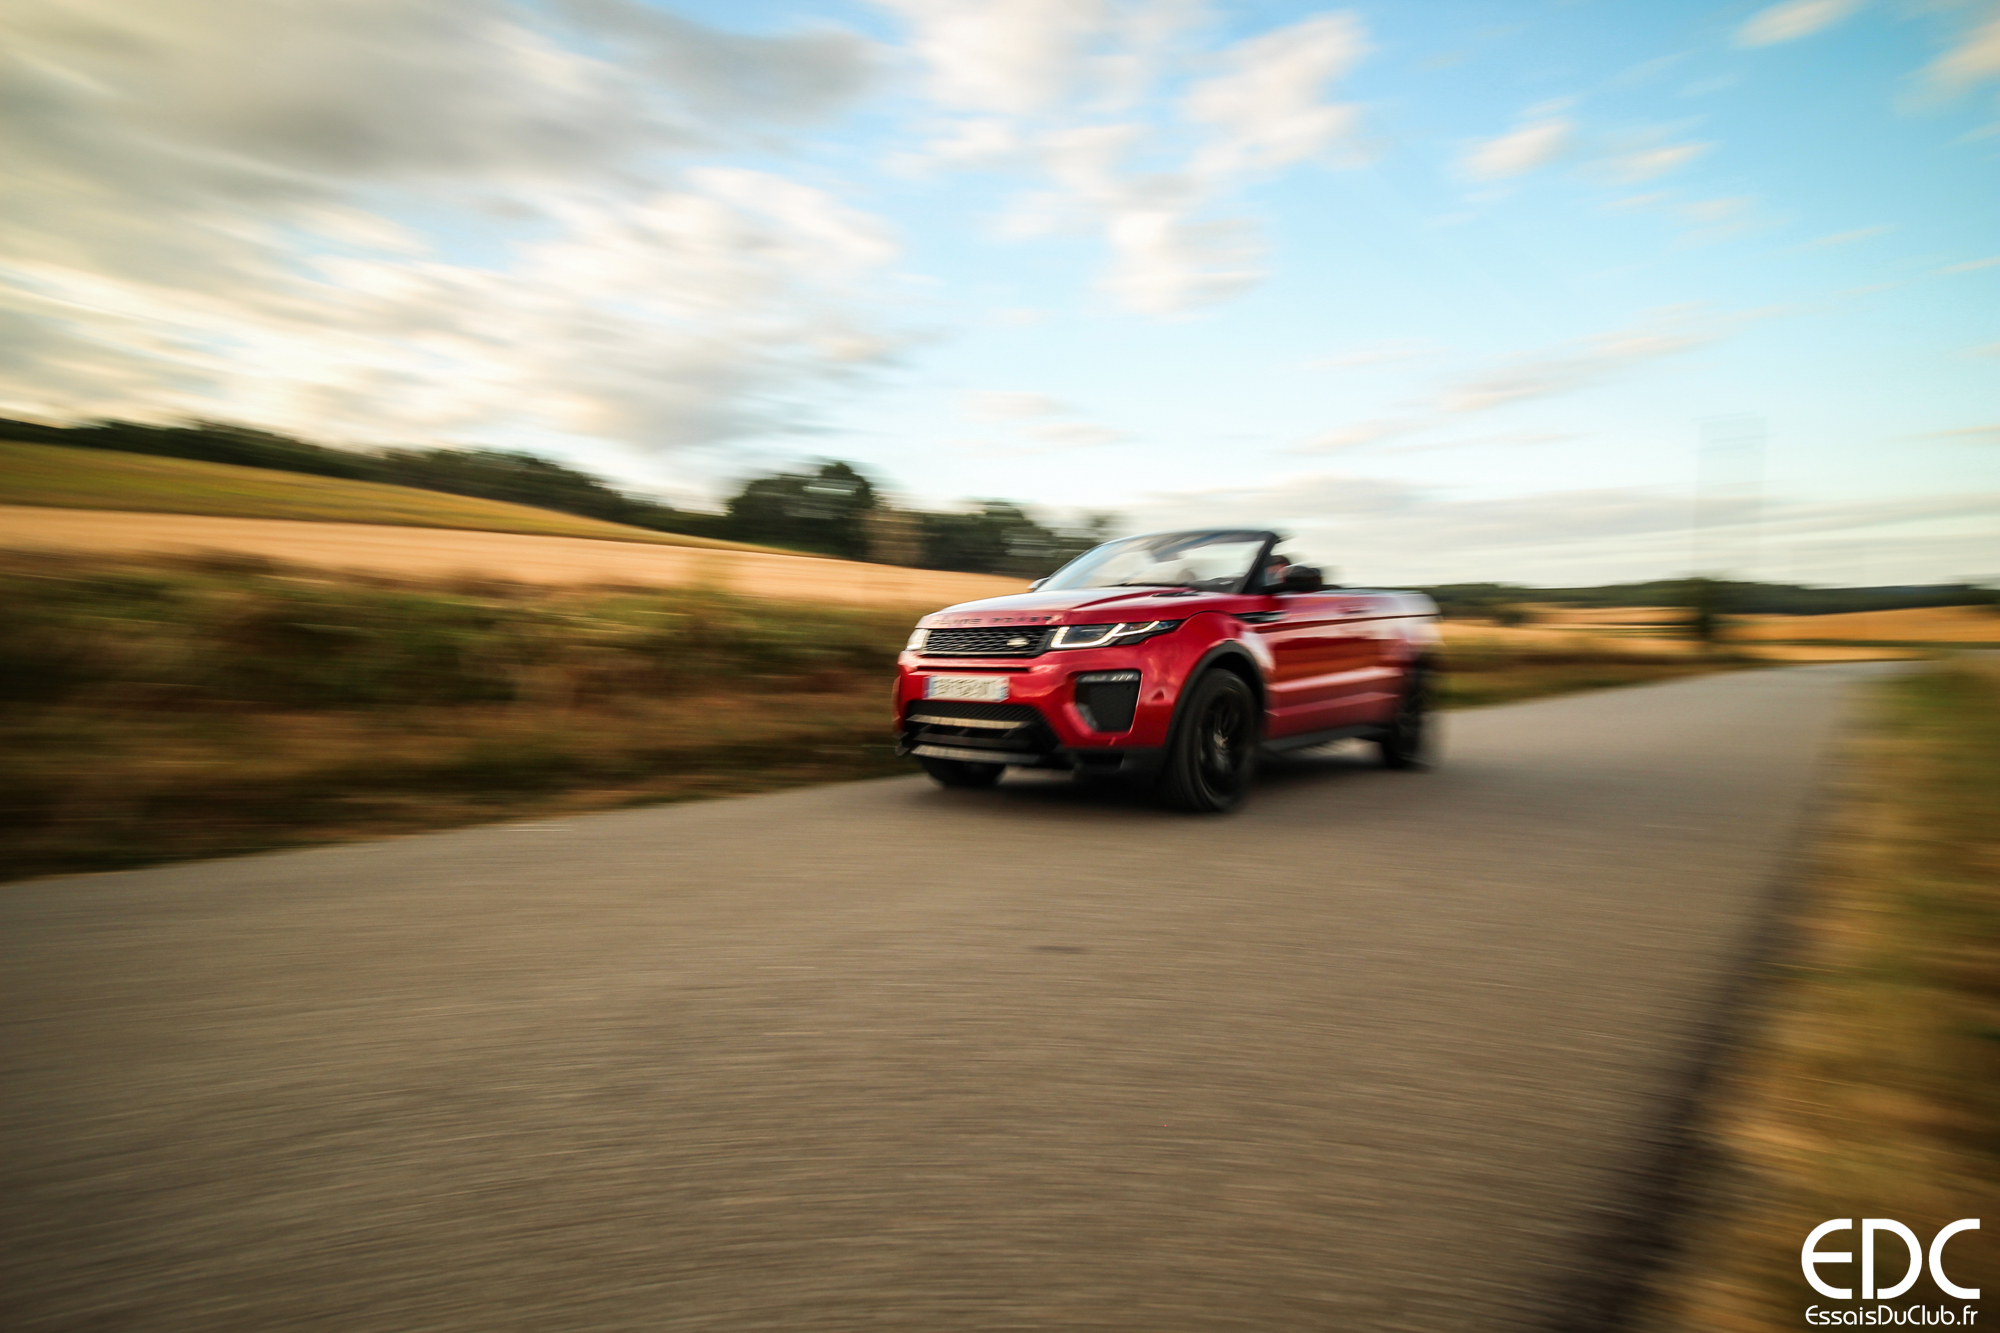 Range Rover Evoque carbiolet sport